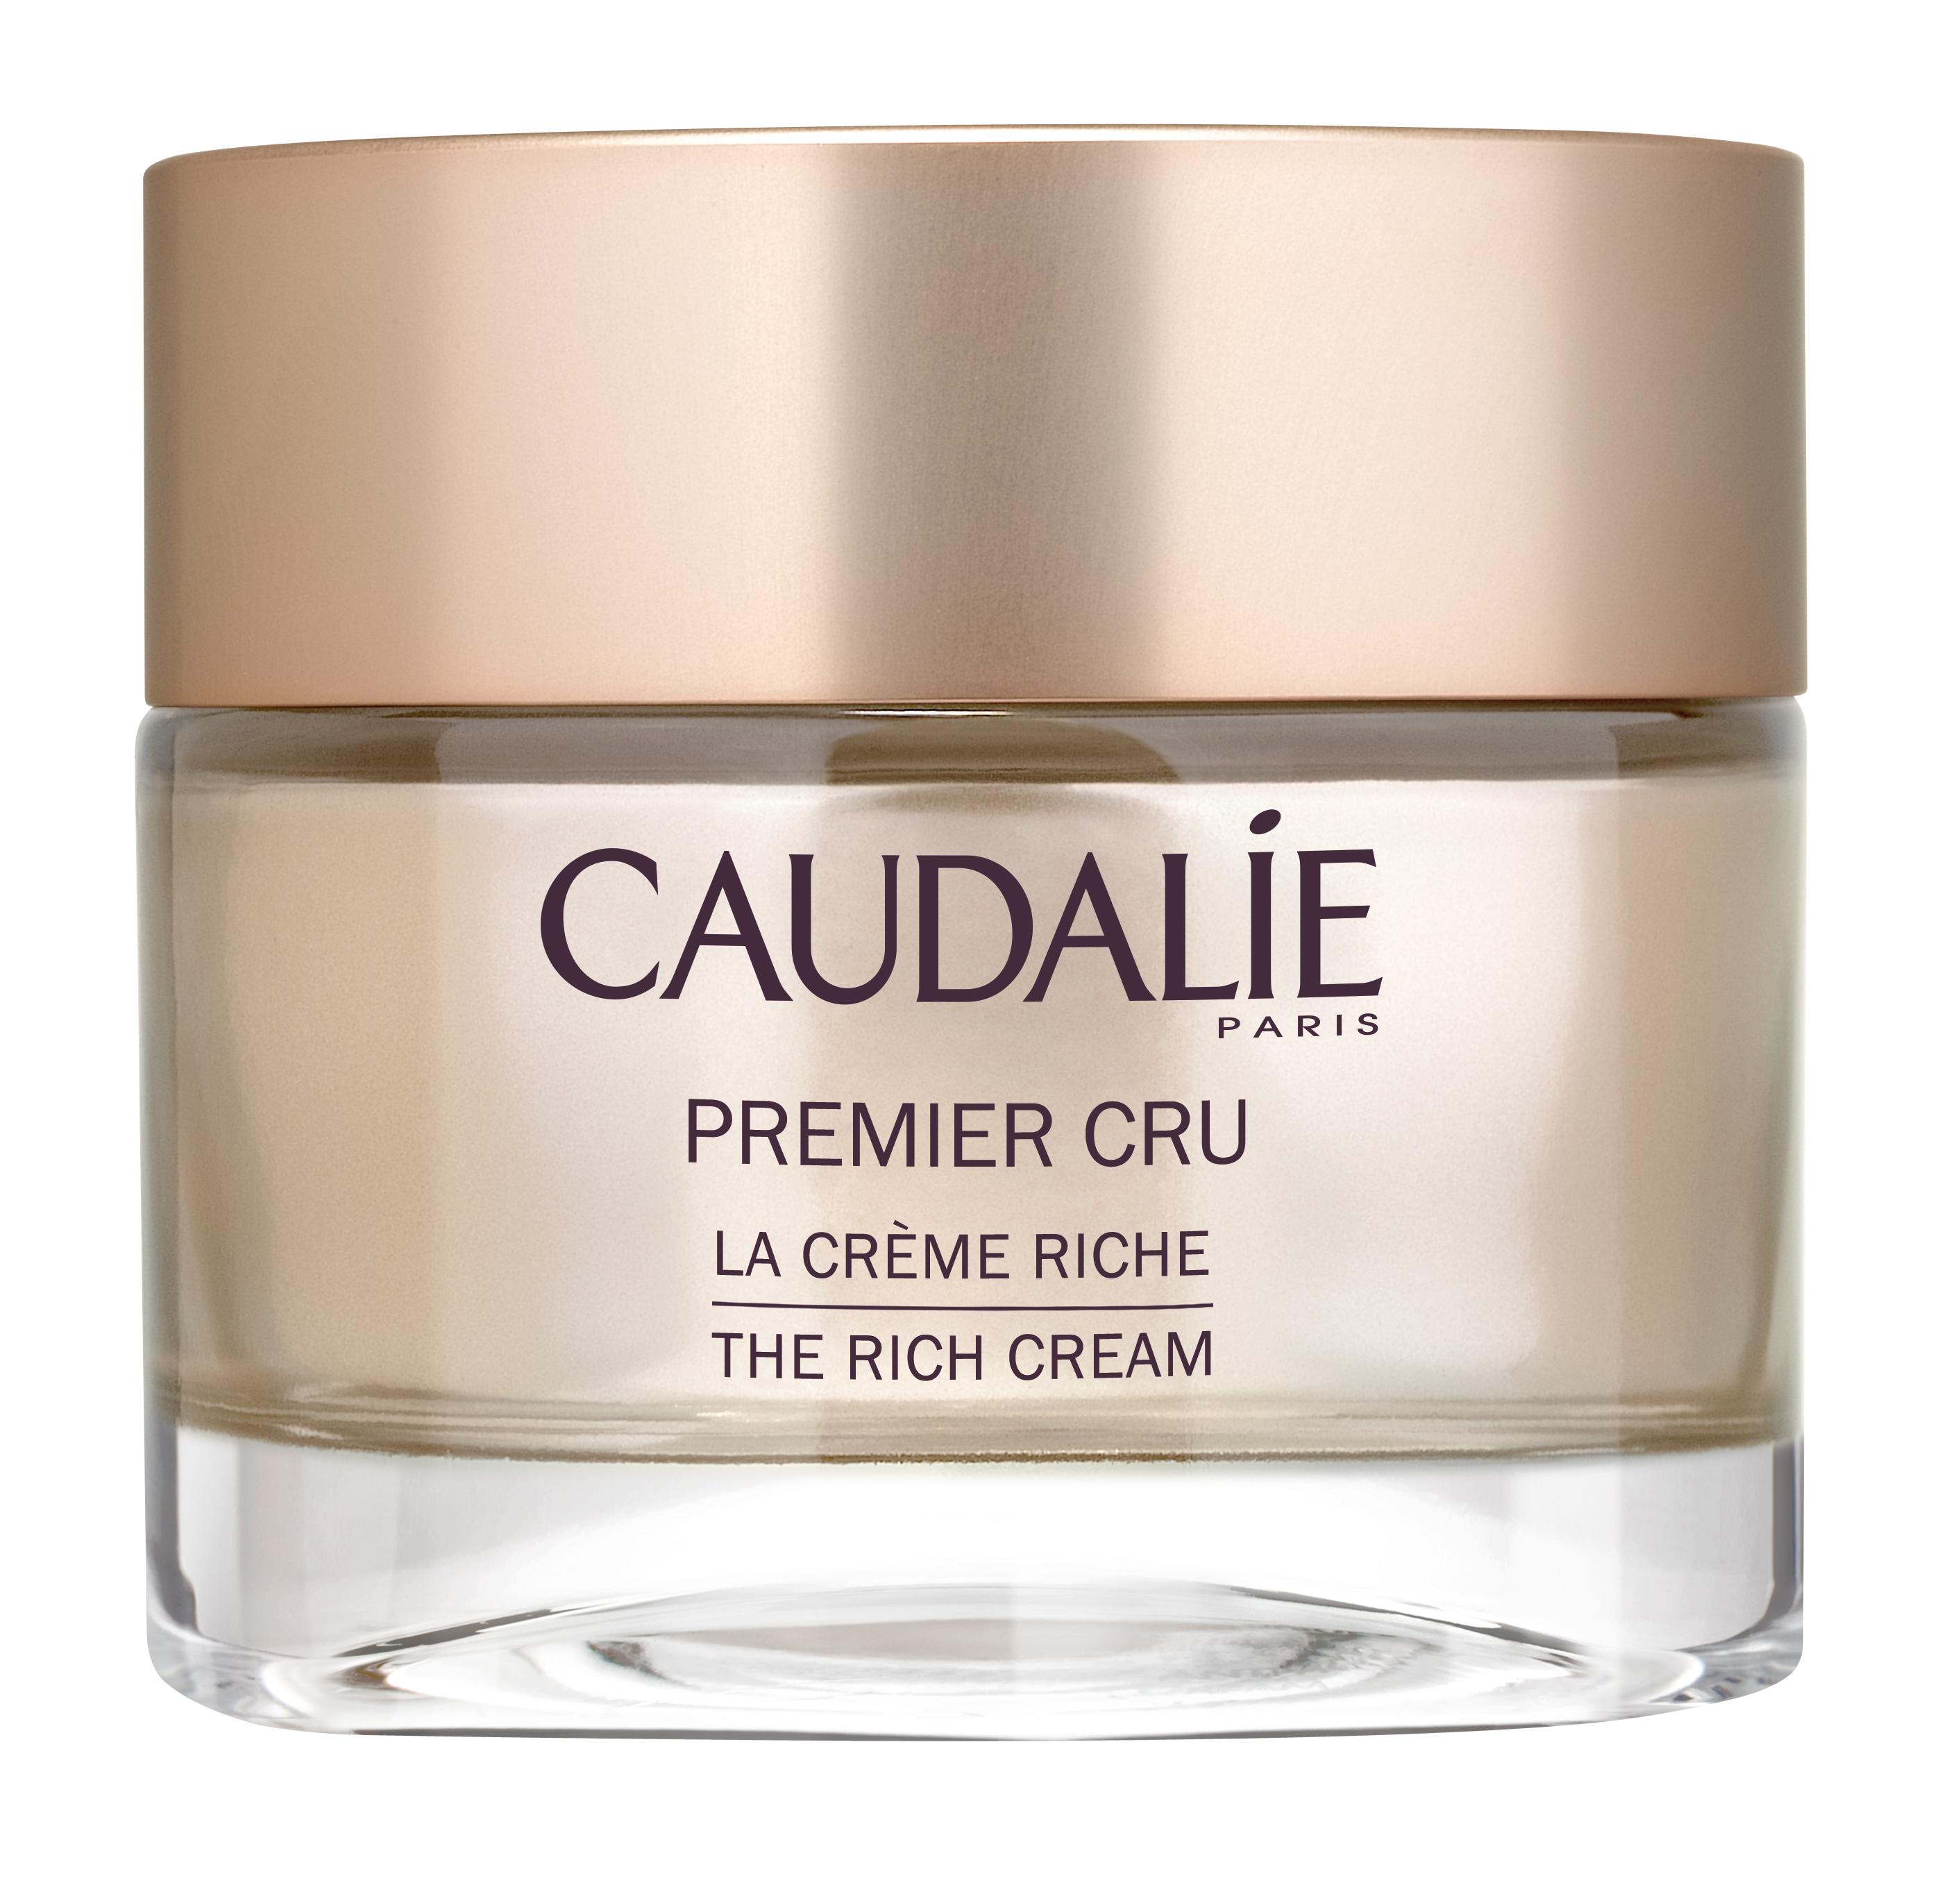 Caudalie Premier Cru The Rich Cream, 50 ml